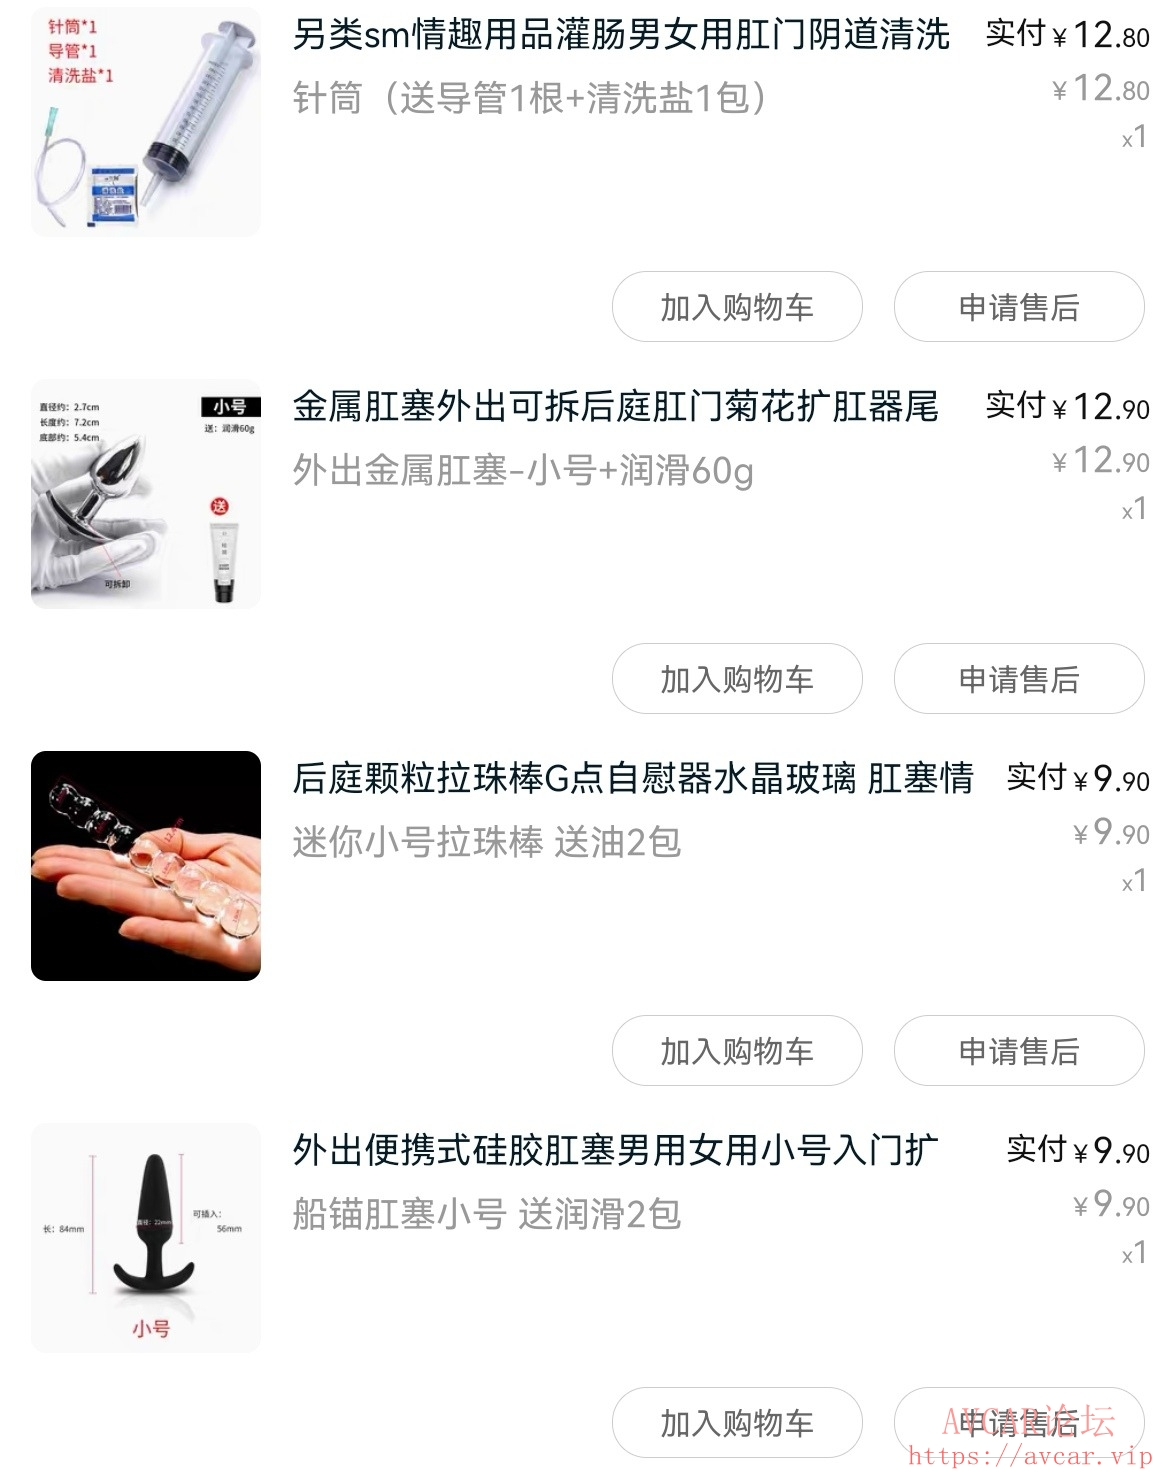 Screenshot_20210608_183209_com.taobao.taobao_edit_7086170885897.jpg